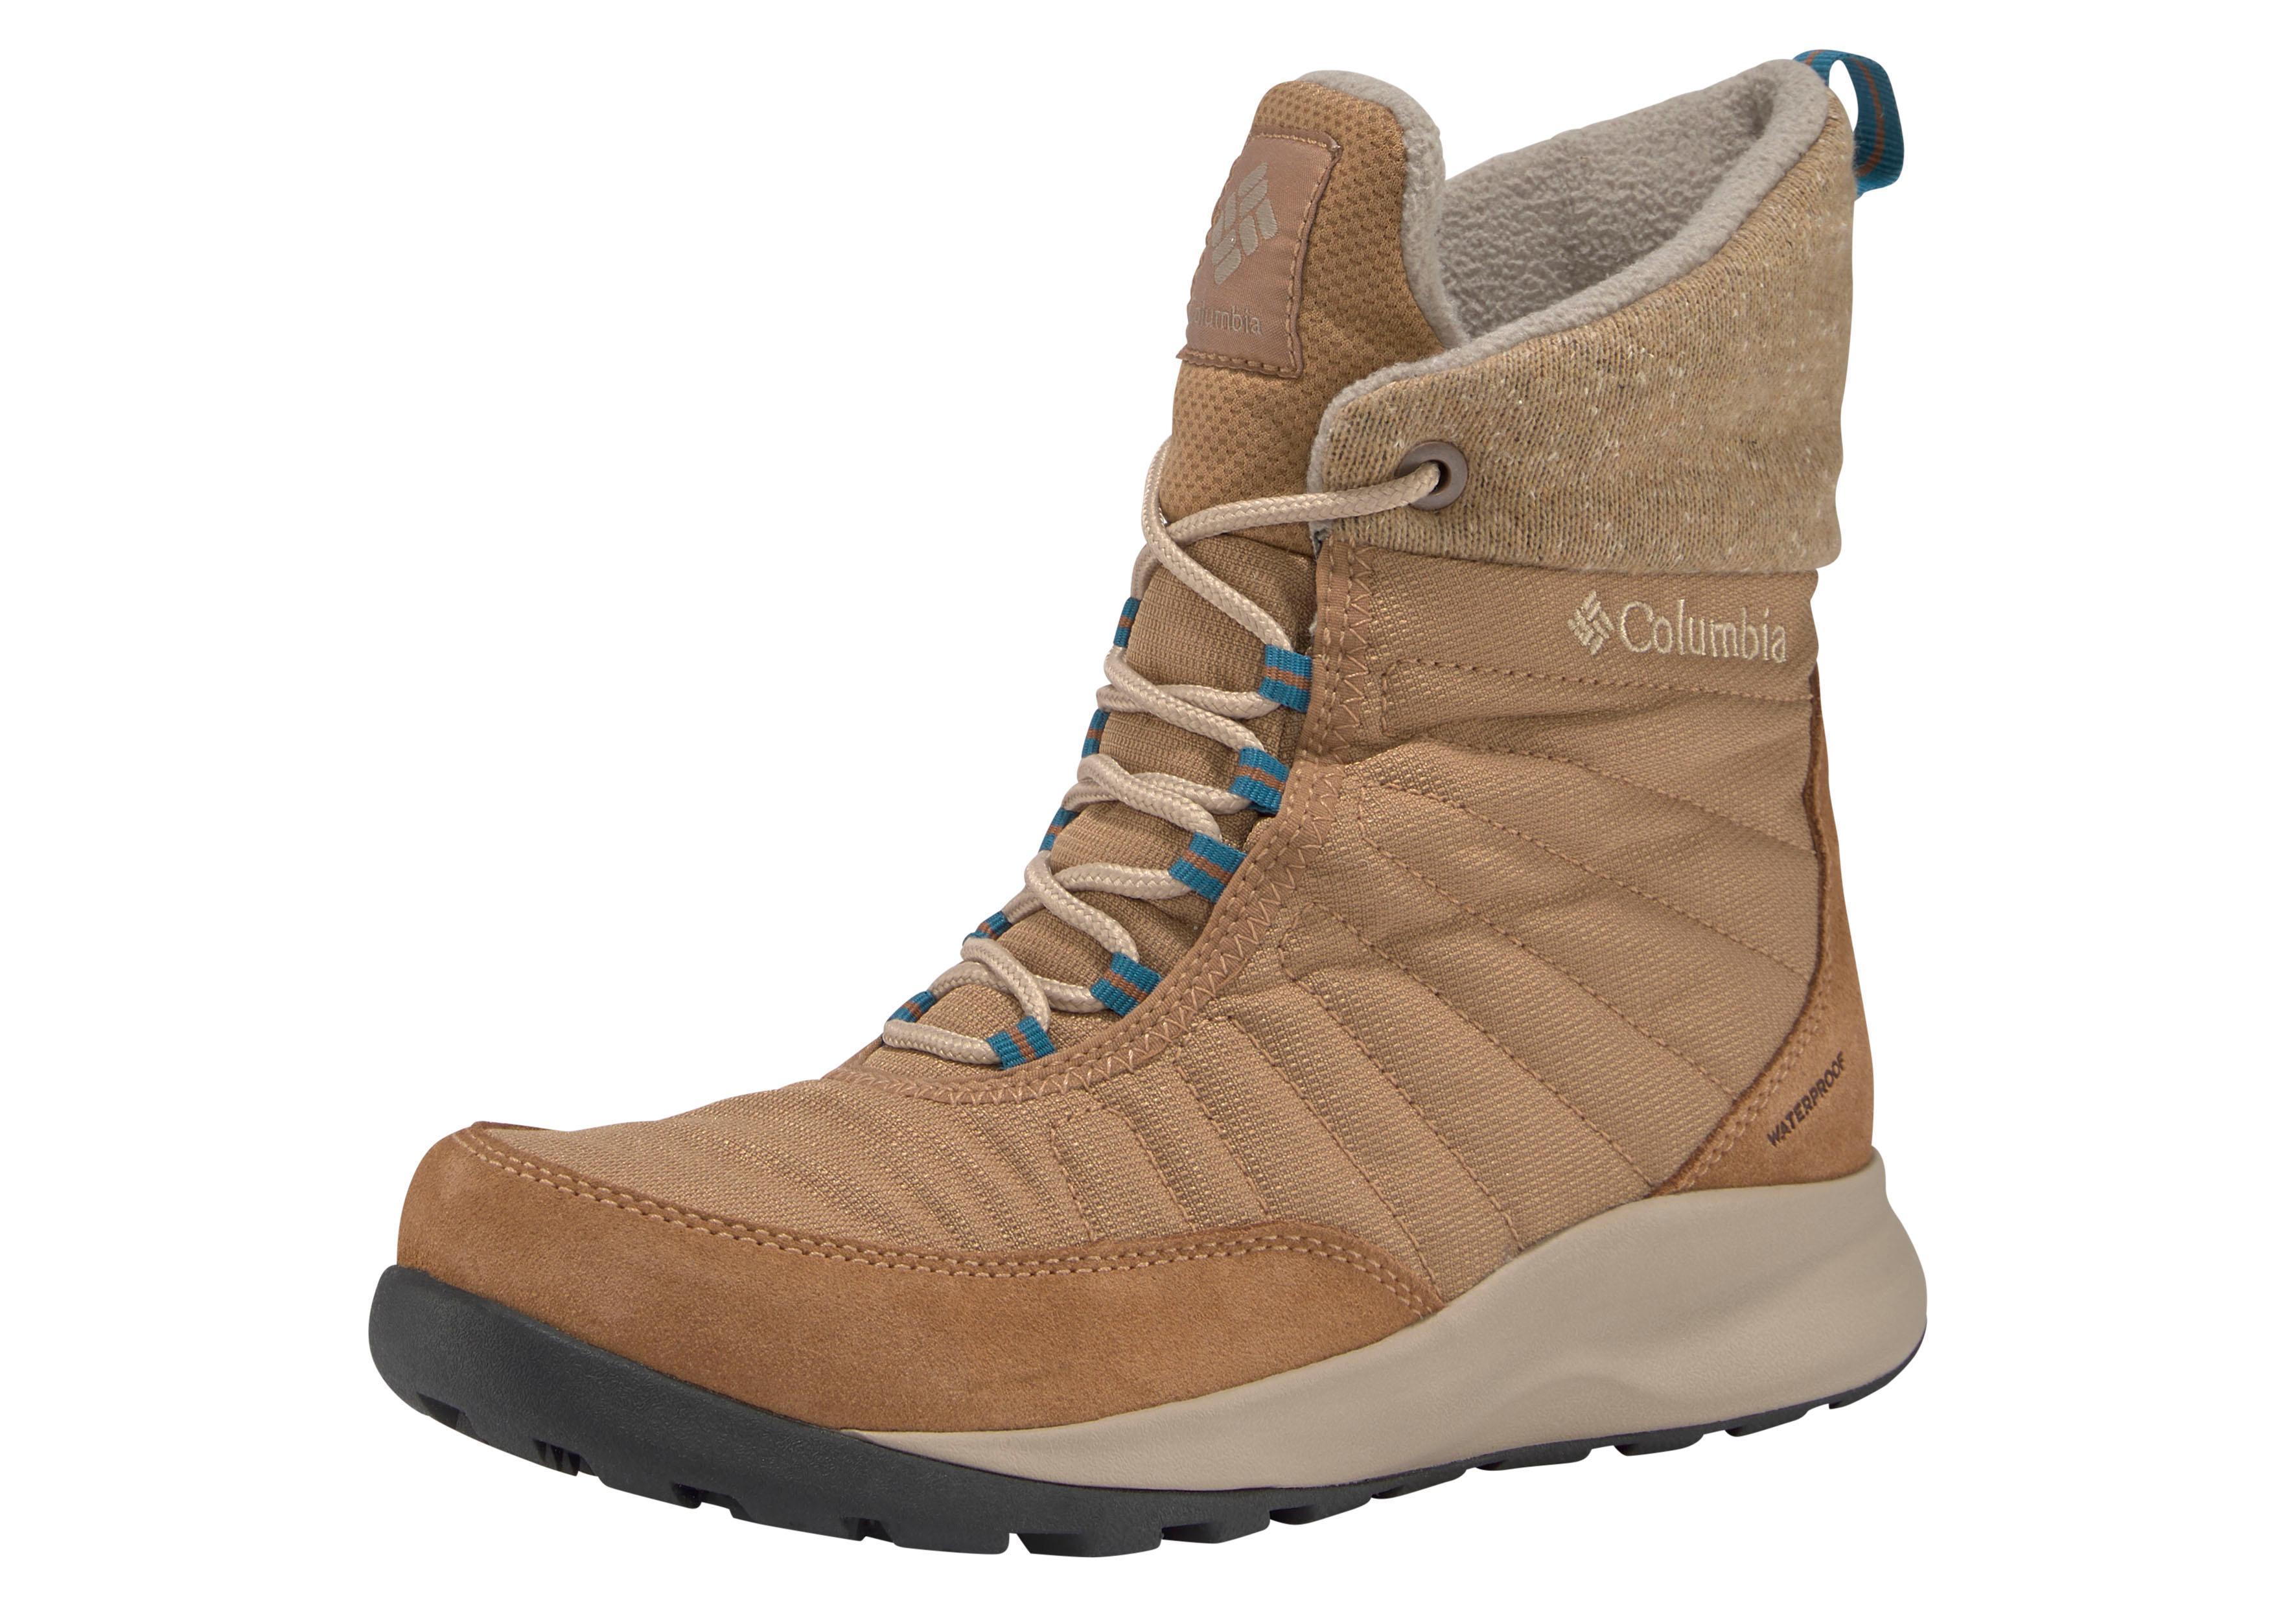 Columbia Outdoorwinterstiefel NIKISKI™ | Schuhe > Outdoorschuhe > Outdoorwinterstiefel | Braun | Columbia